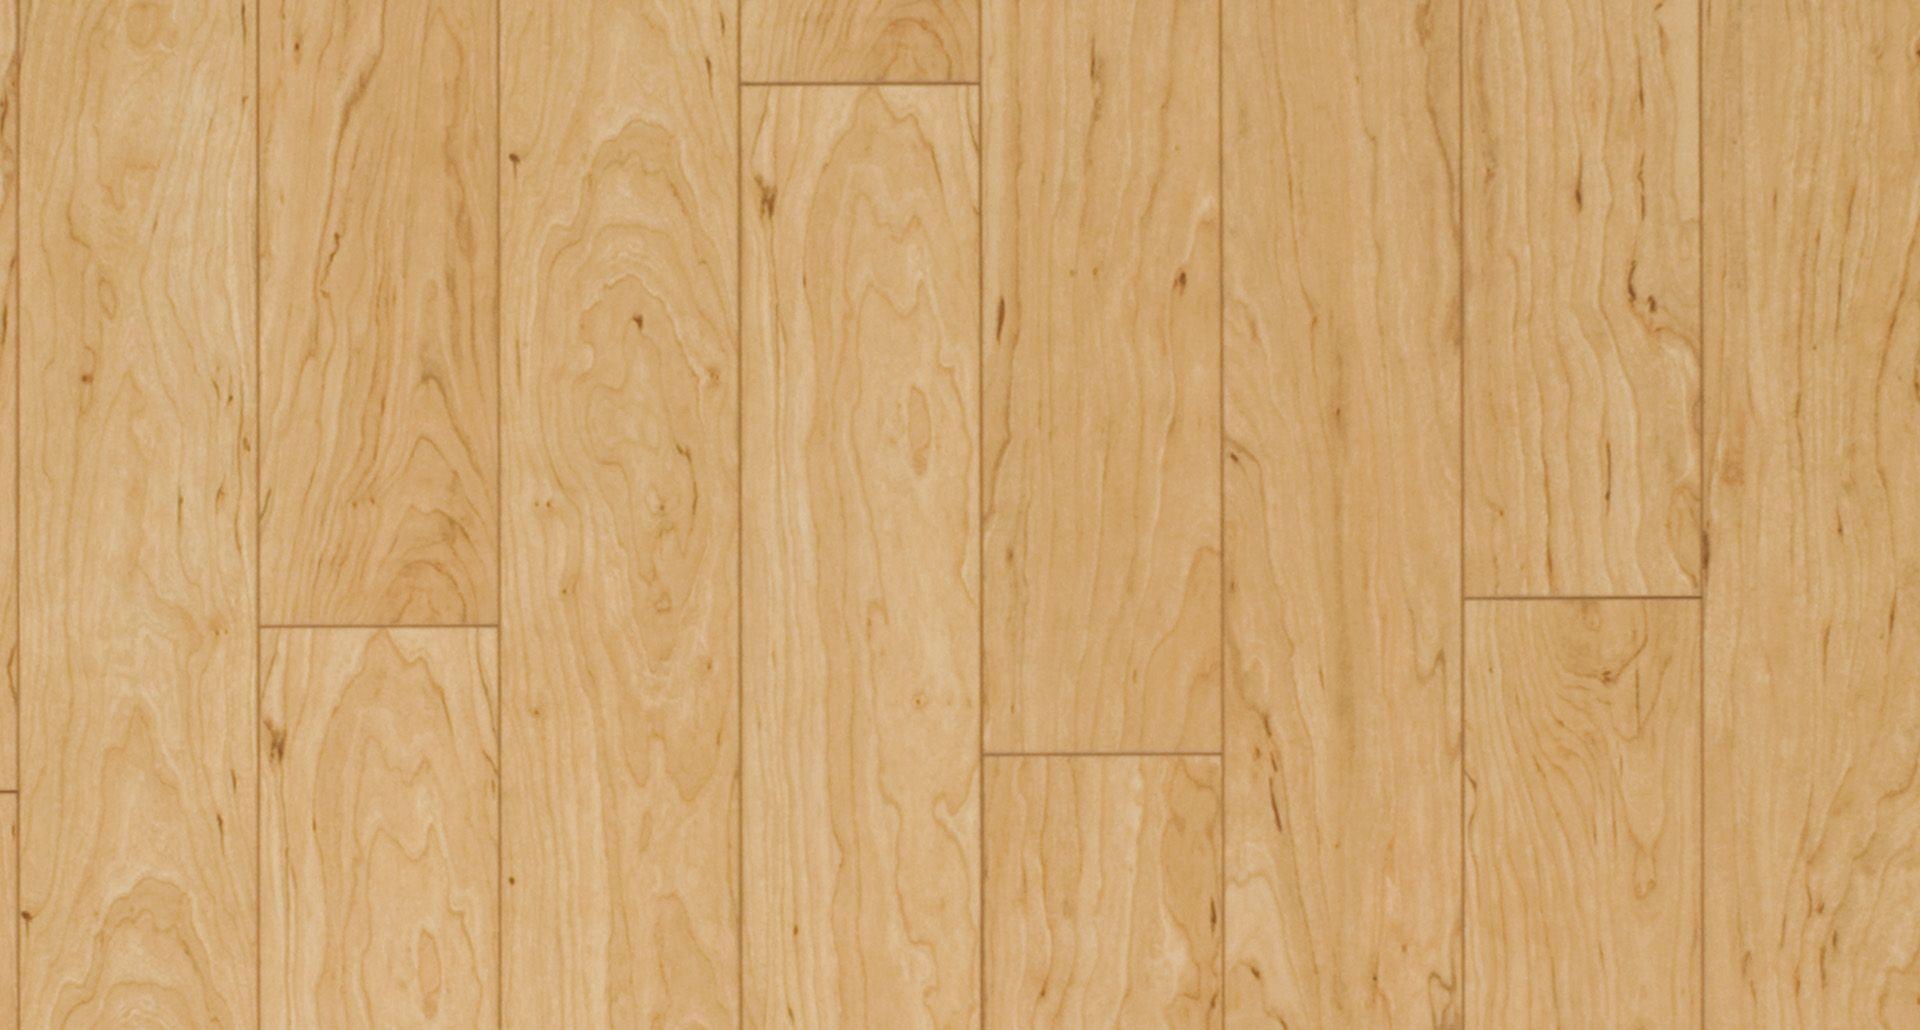 Vermont Maple Textured Laminate Floor Light Maple Wood Finish 10mm 1 Strip Plank Laminate Flooring Easy To Install And Pergo Lifetime Warranty